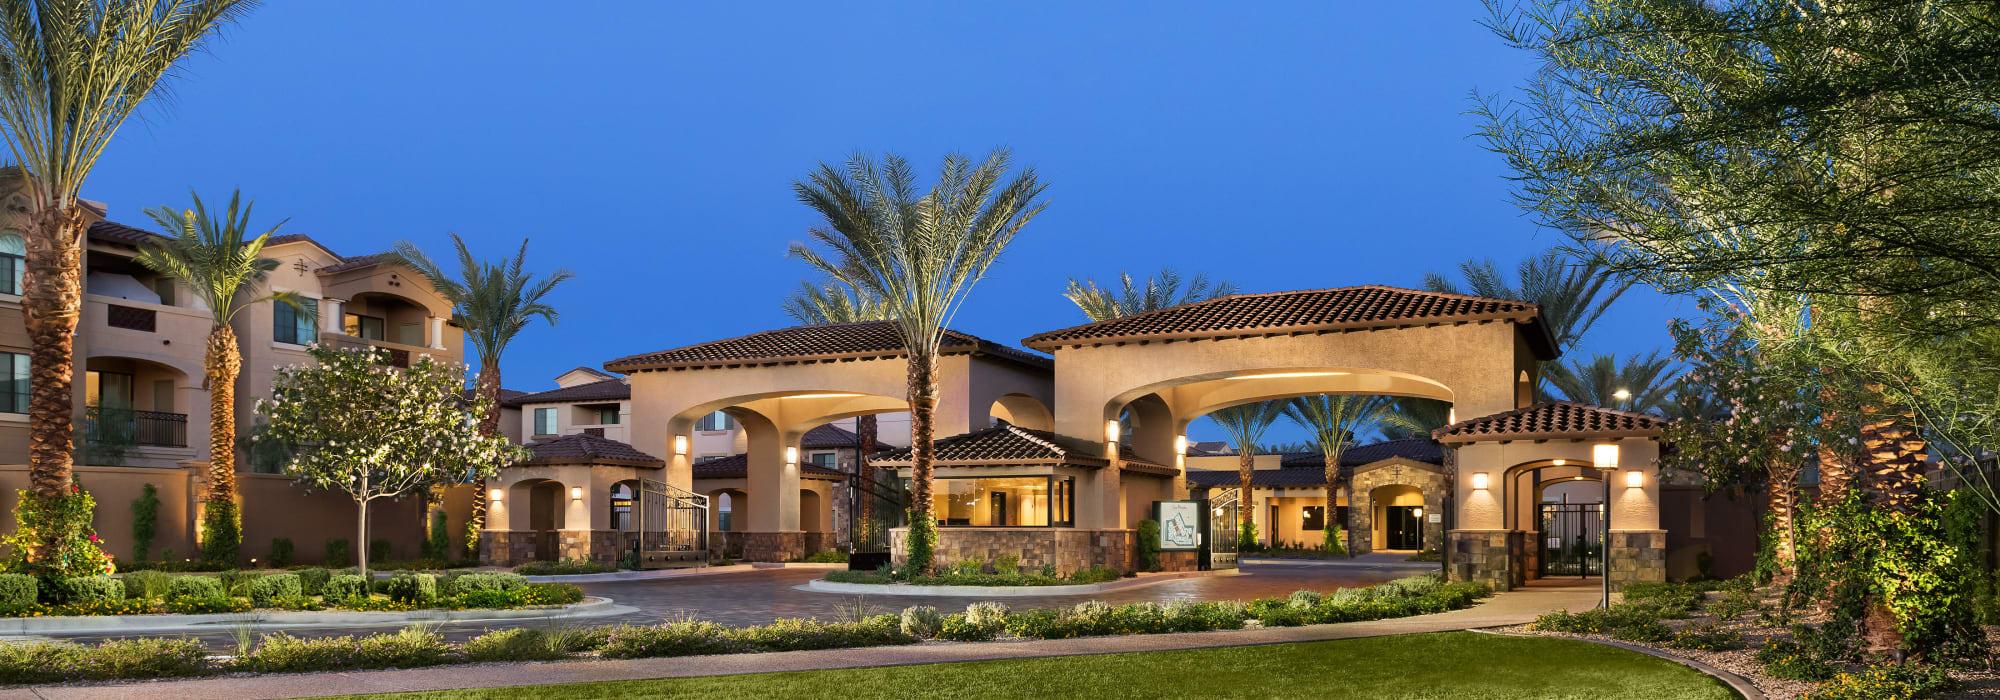 Lovely landscaping at San Portales in Scottsdale, Arizona